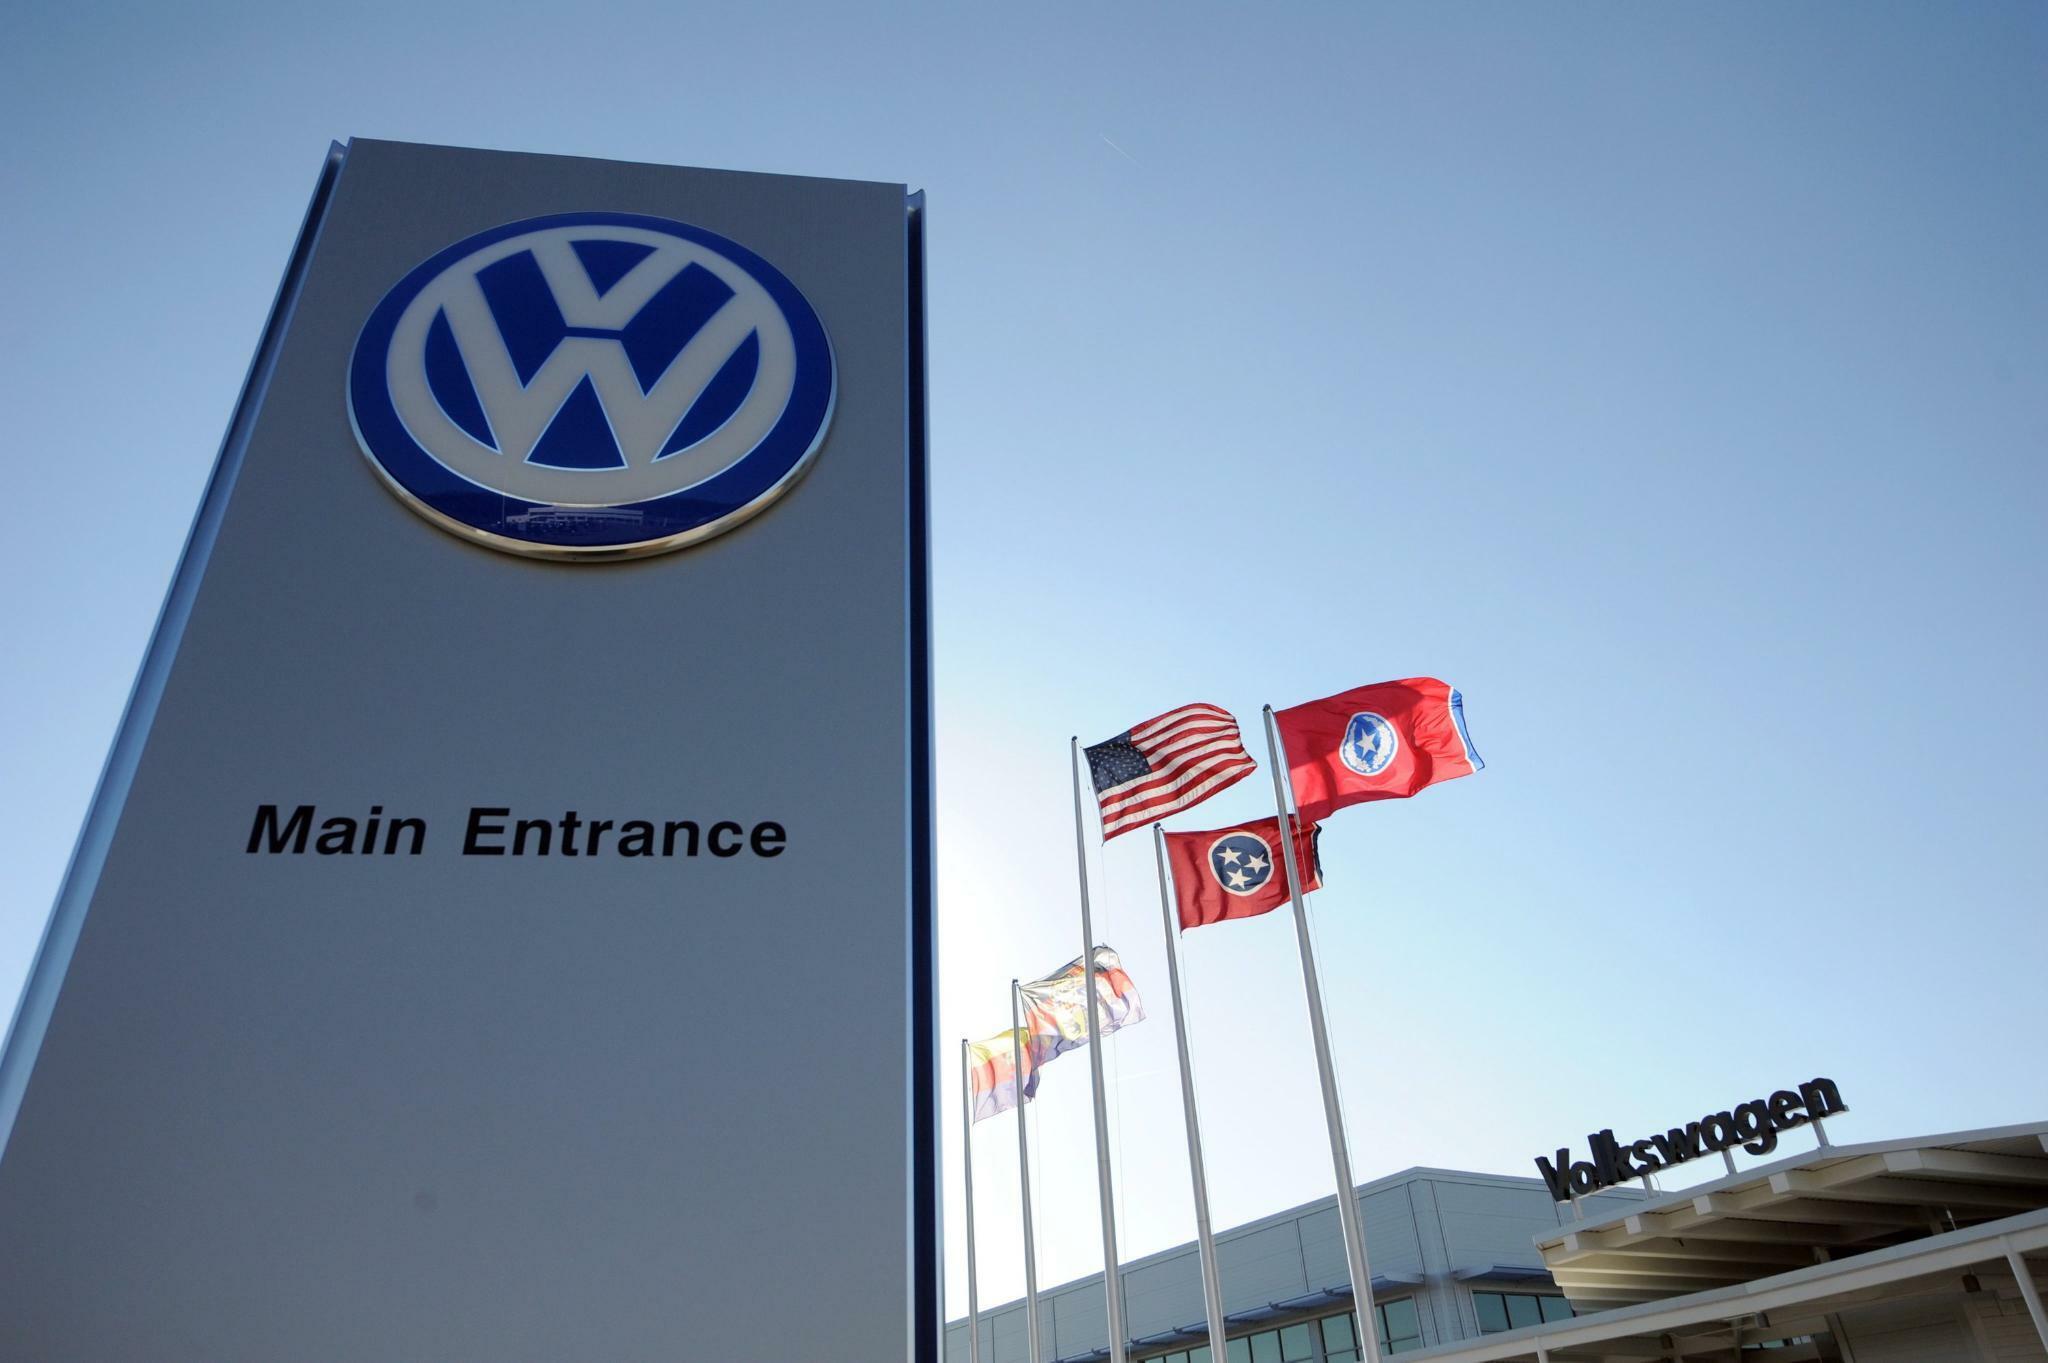 Dieselaffäre: Kanada klagt Volkswagen an